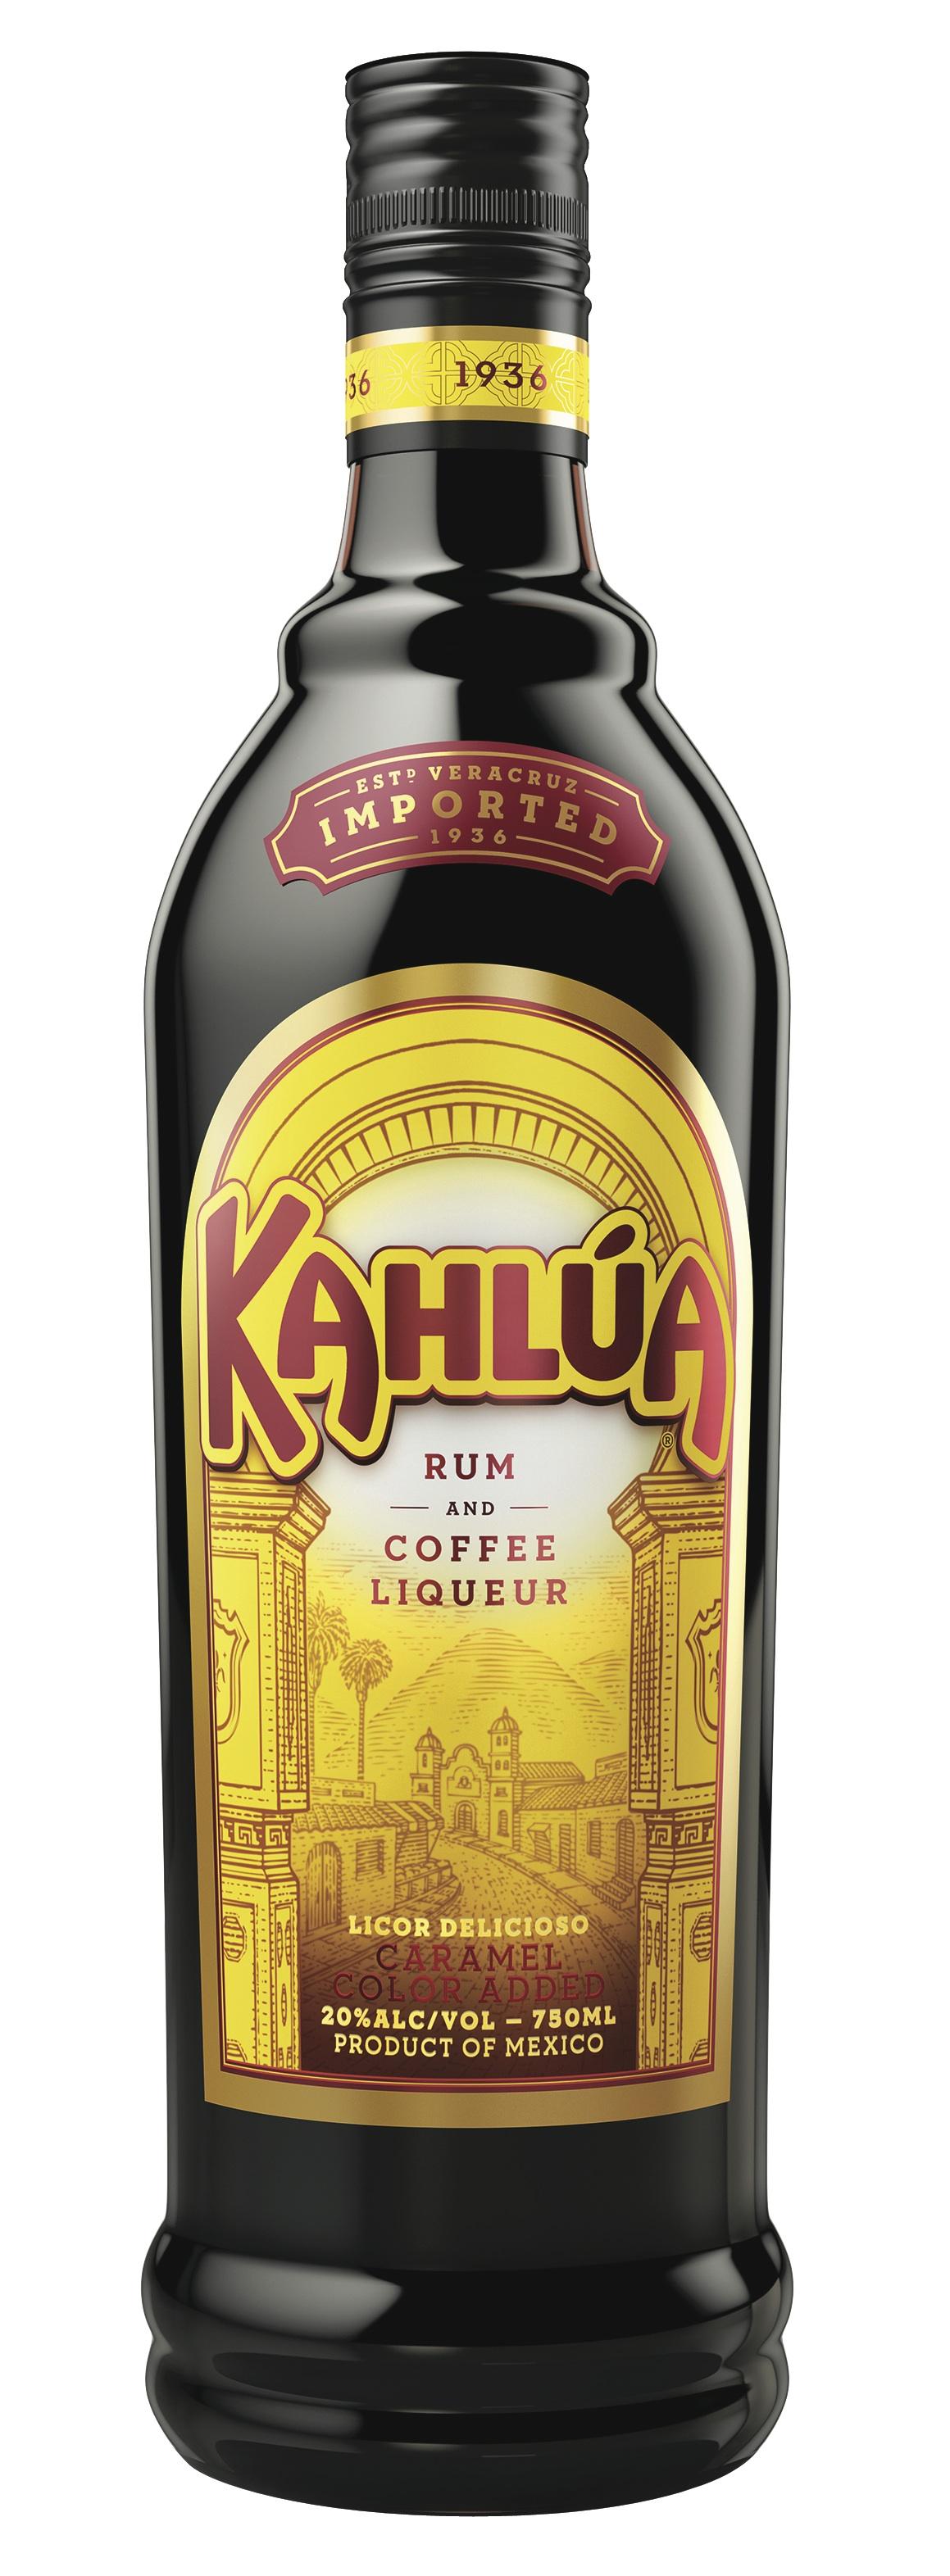 Kahlua Enhances Its Look | The Beverage Journal